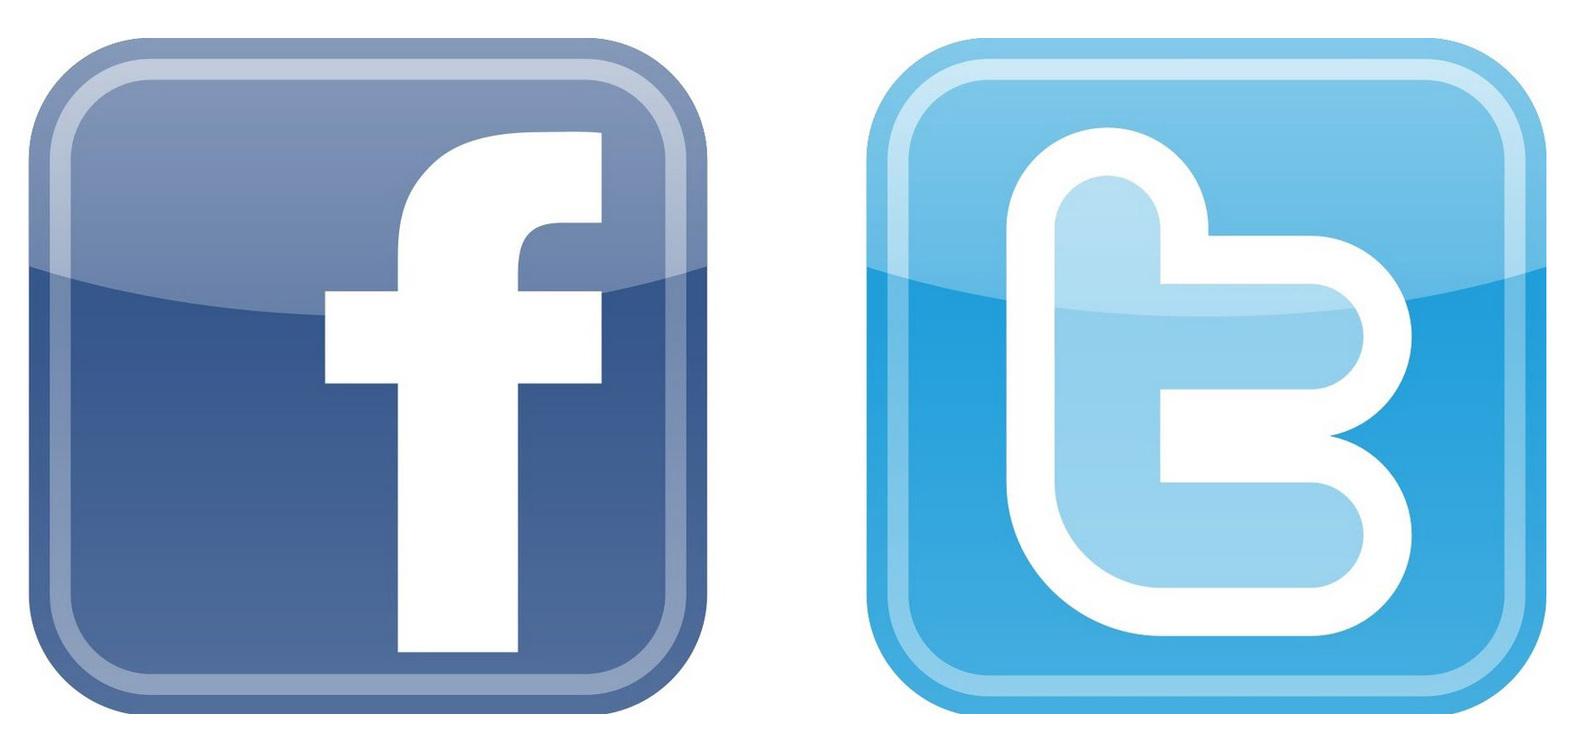 Logo de fb clipart free stock Facebook Like Clipart | Free download best Facebook Like Clipart on ... free stock